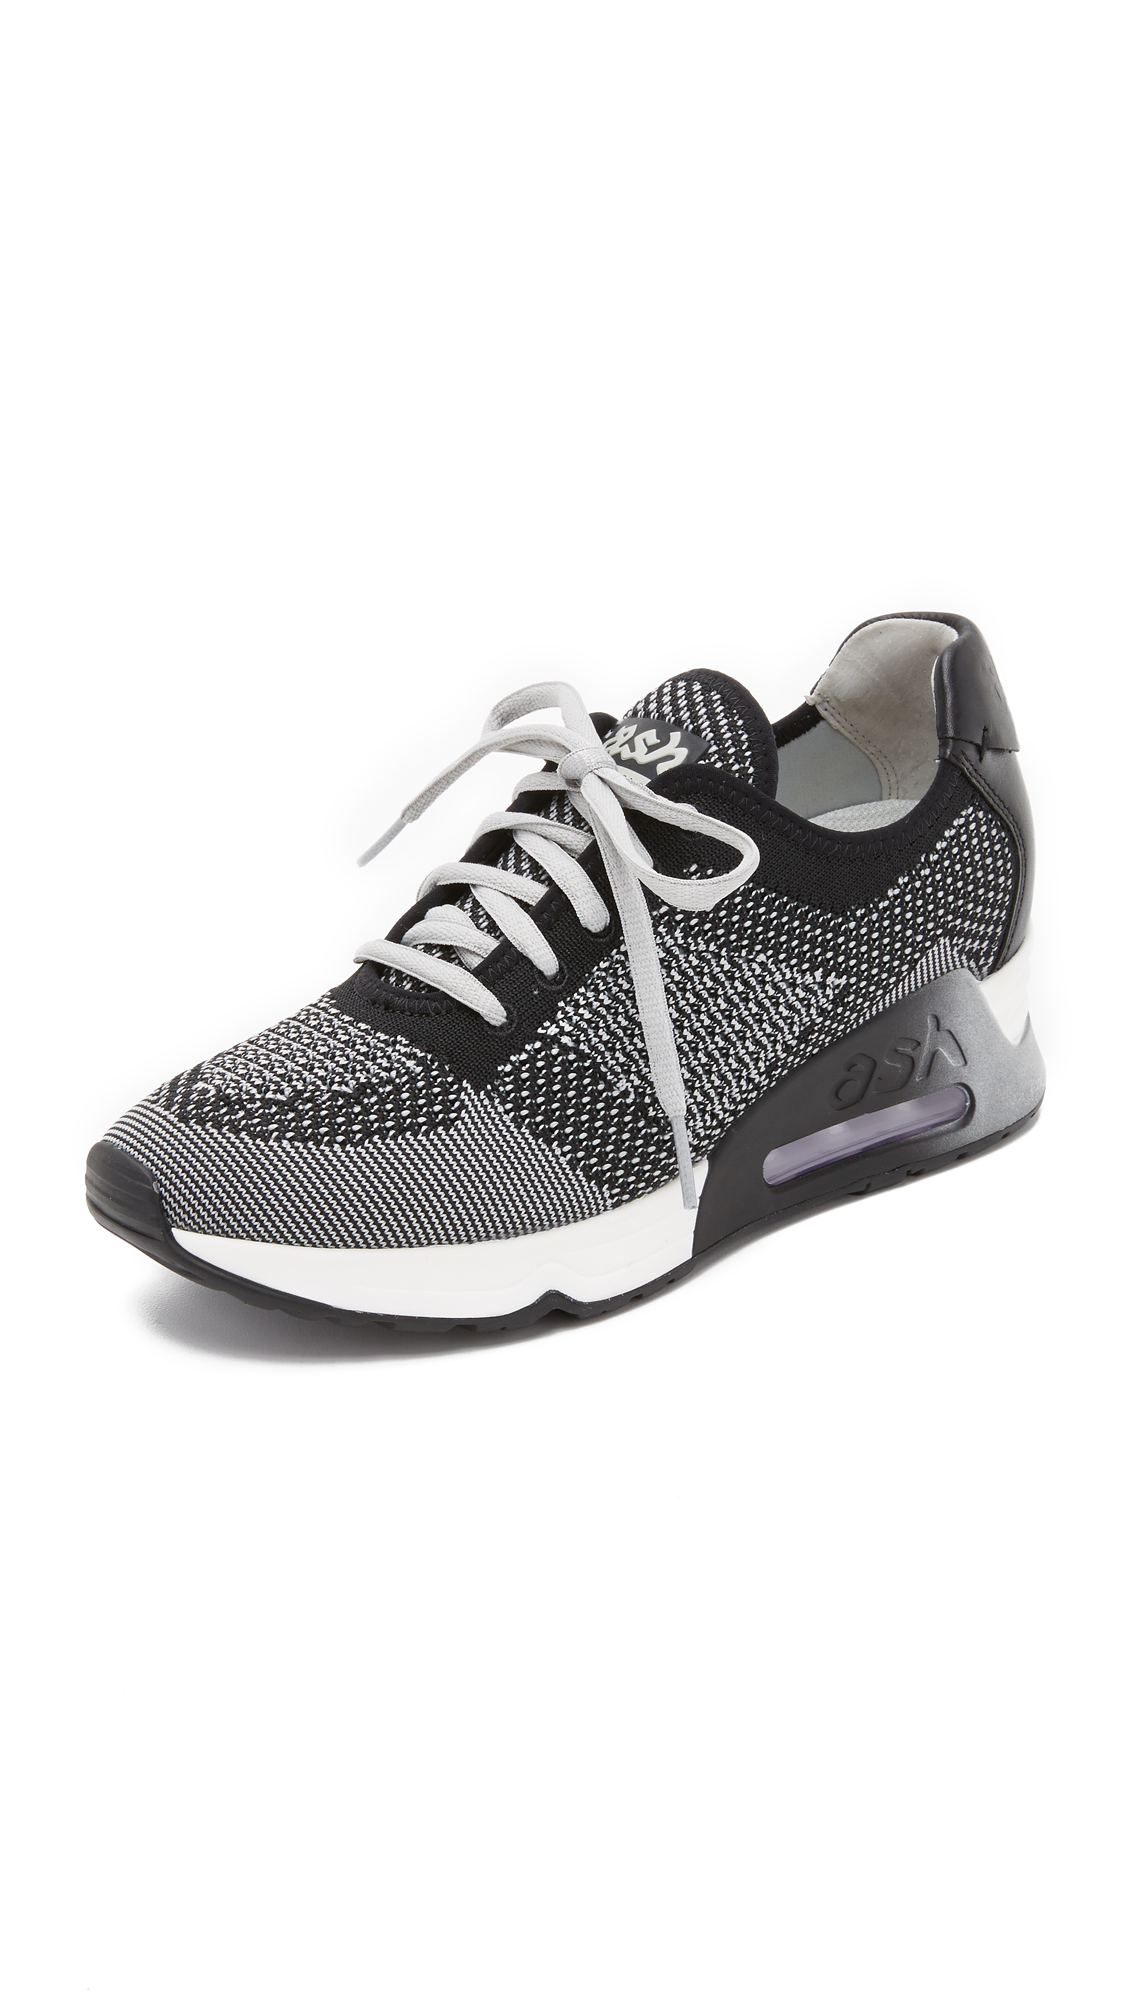 ash-marbleblack-lucky-sneakers-marblebla